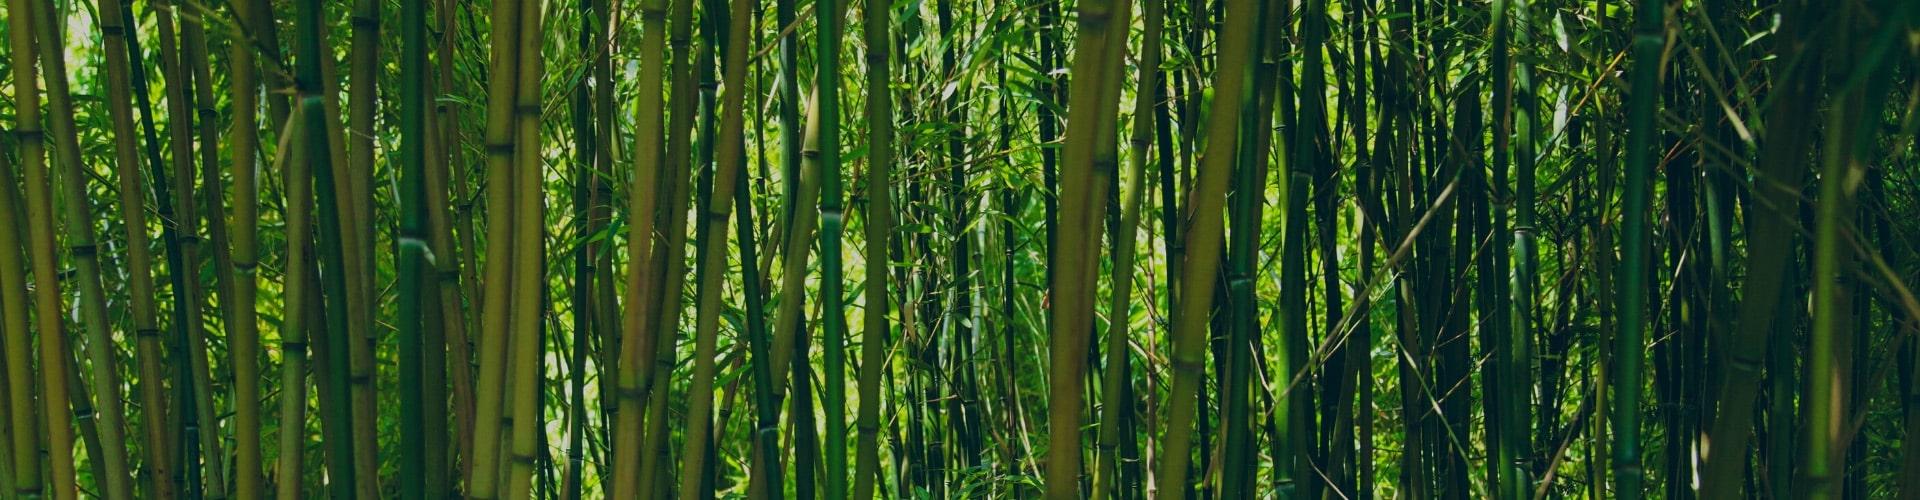 bio-bambus-in-natuerlicher-form-Zutaten_Ogaenics